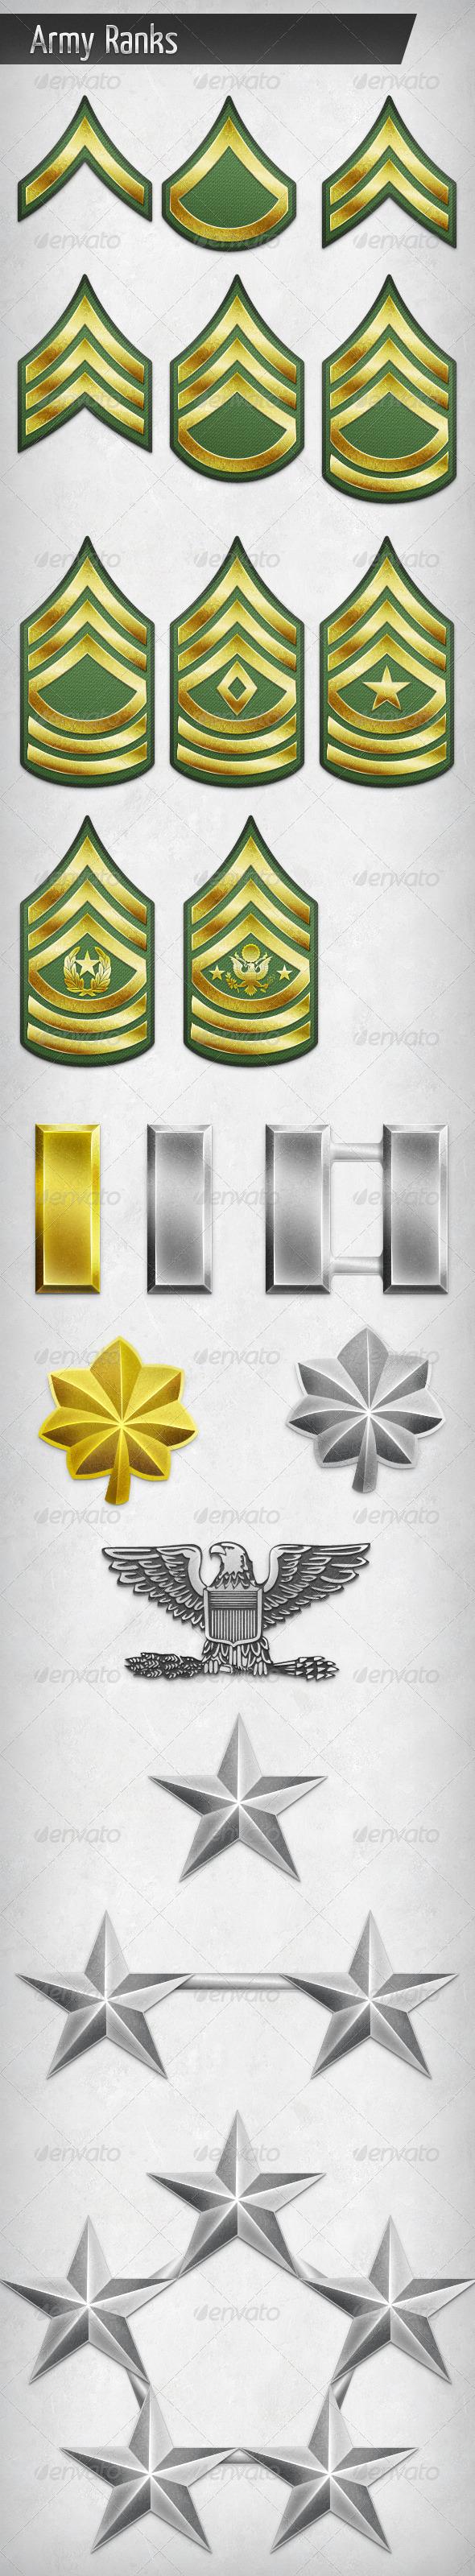 GraphicRiver Army Rank Insignias 5629285